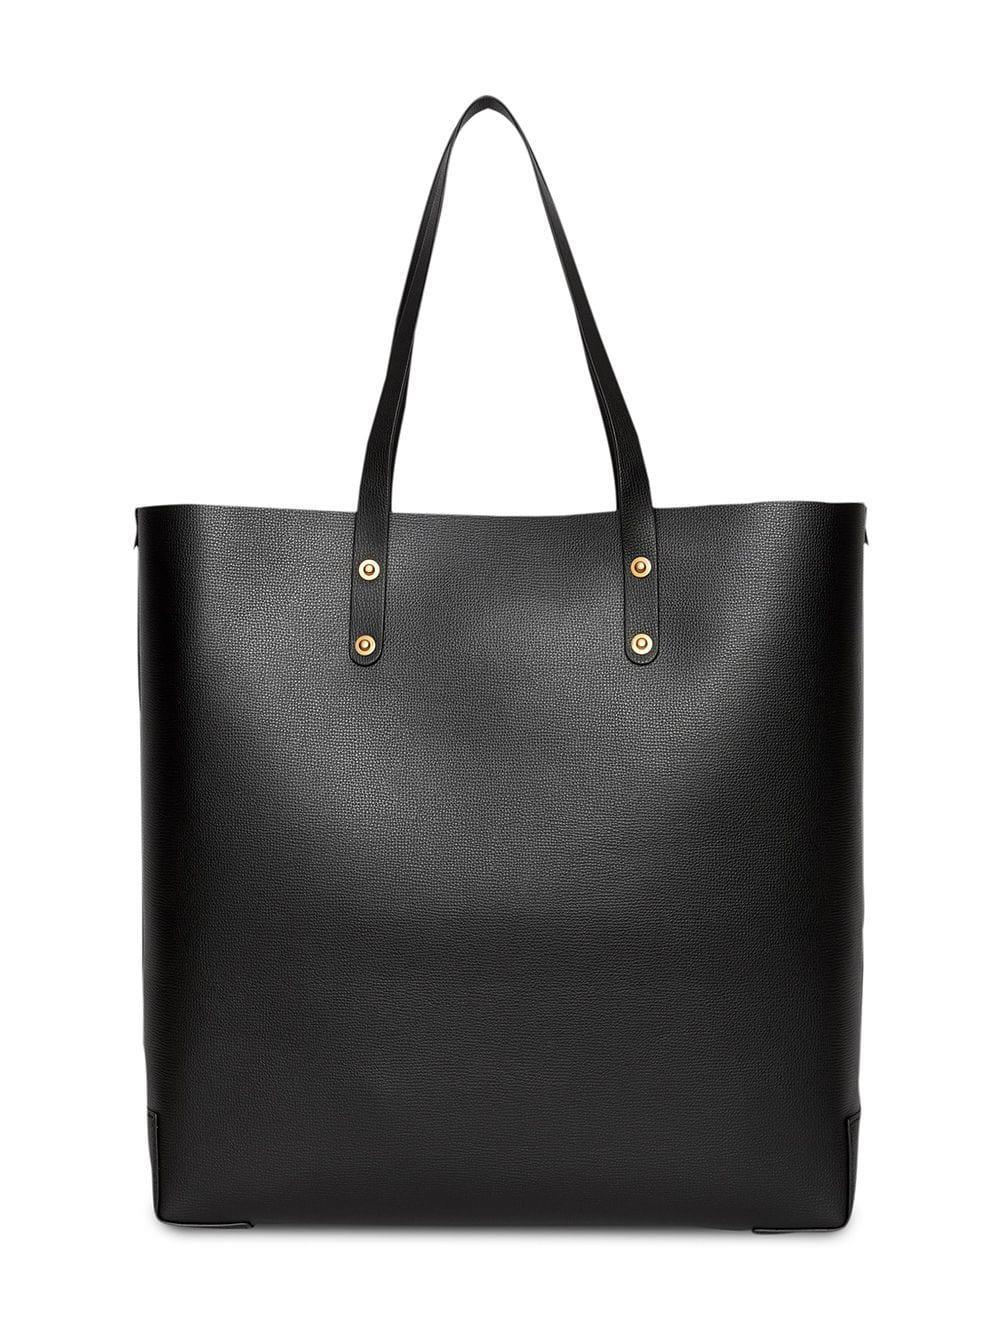 Burberry - Black Embossed Crest Leather Tote - Lyst. View fullscreen d39fdb7c55f1f